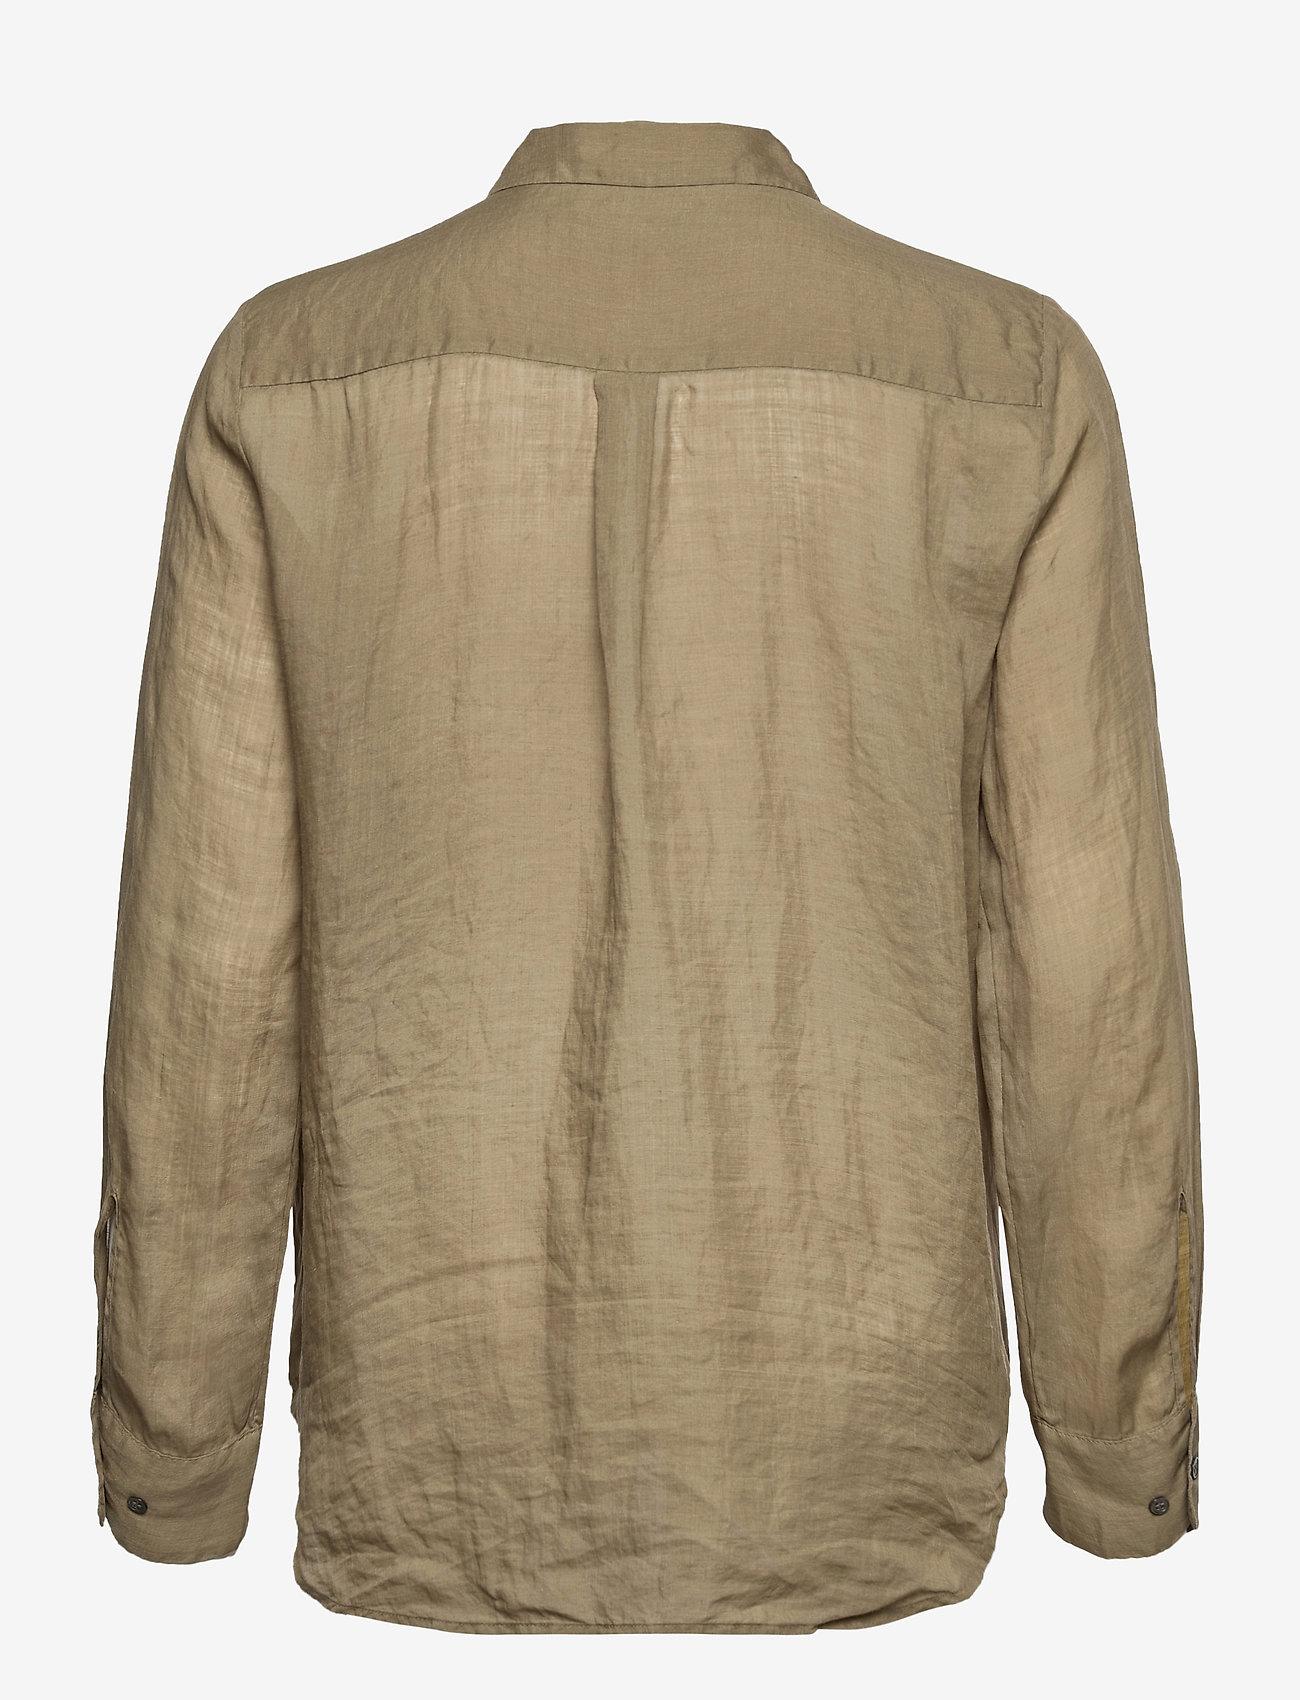 SAND - 8851 - Nami - overhemden met lange mouwen - army green - 1